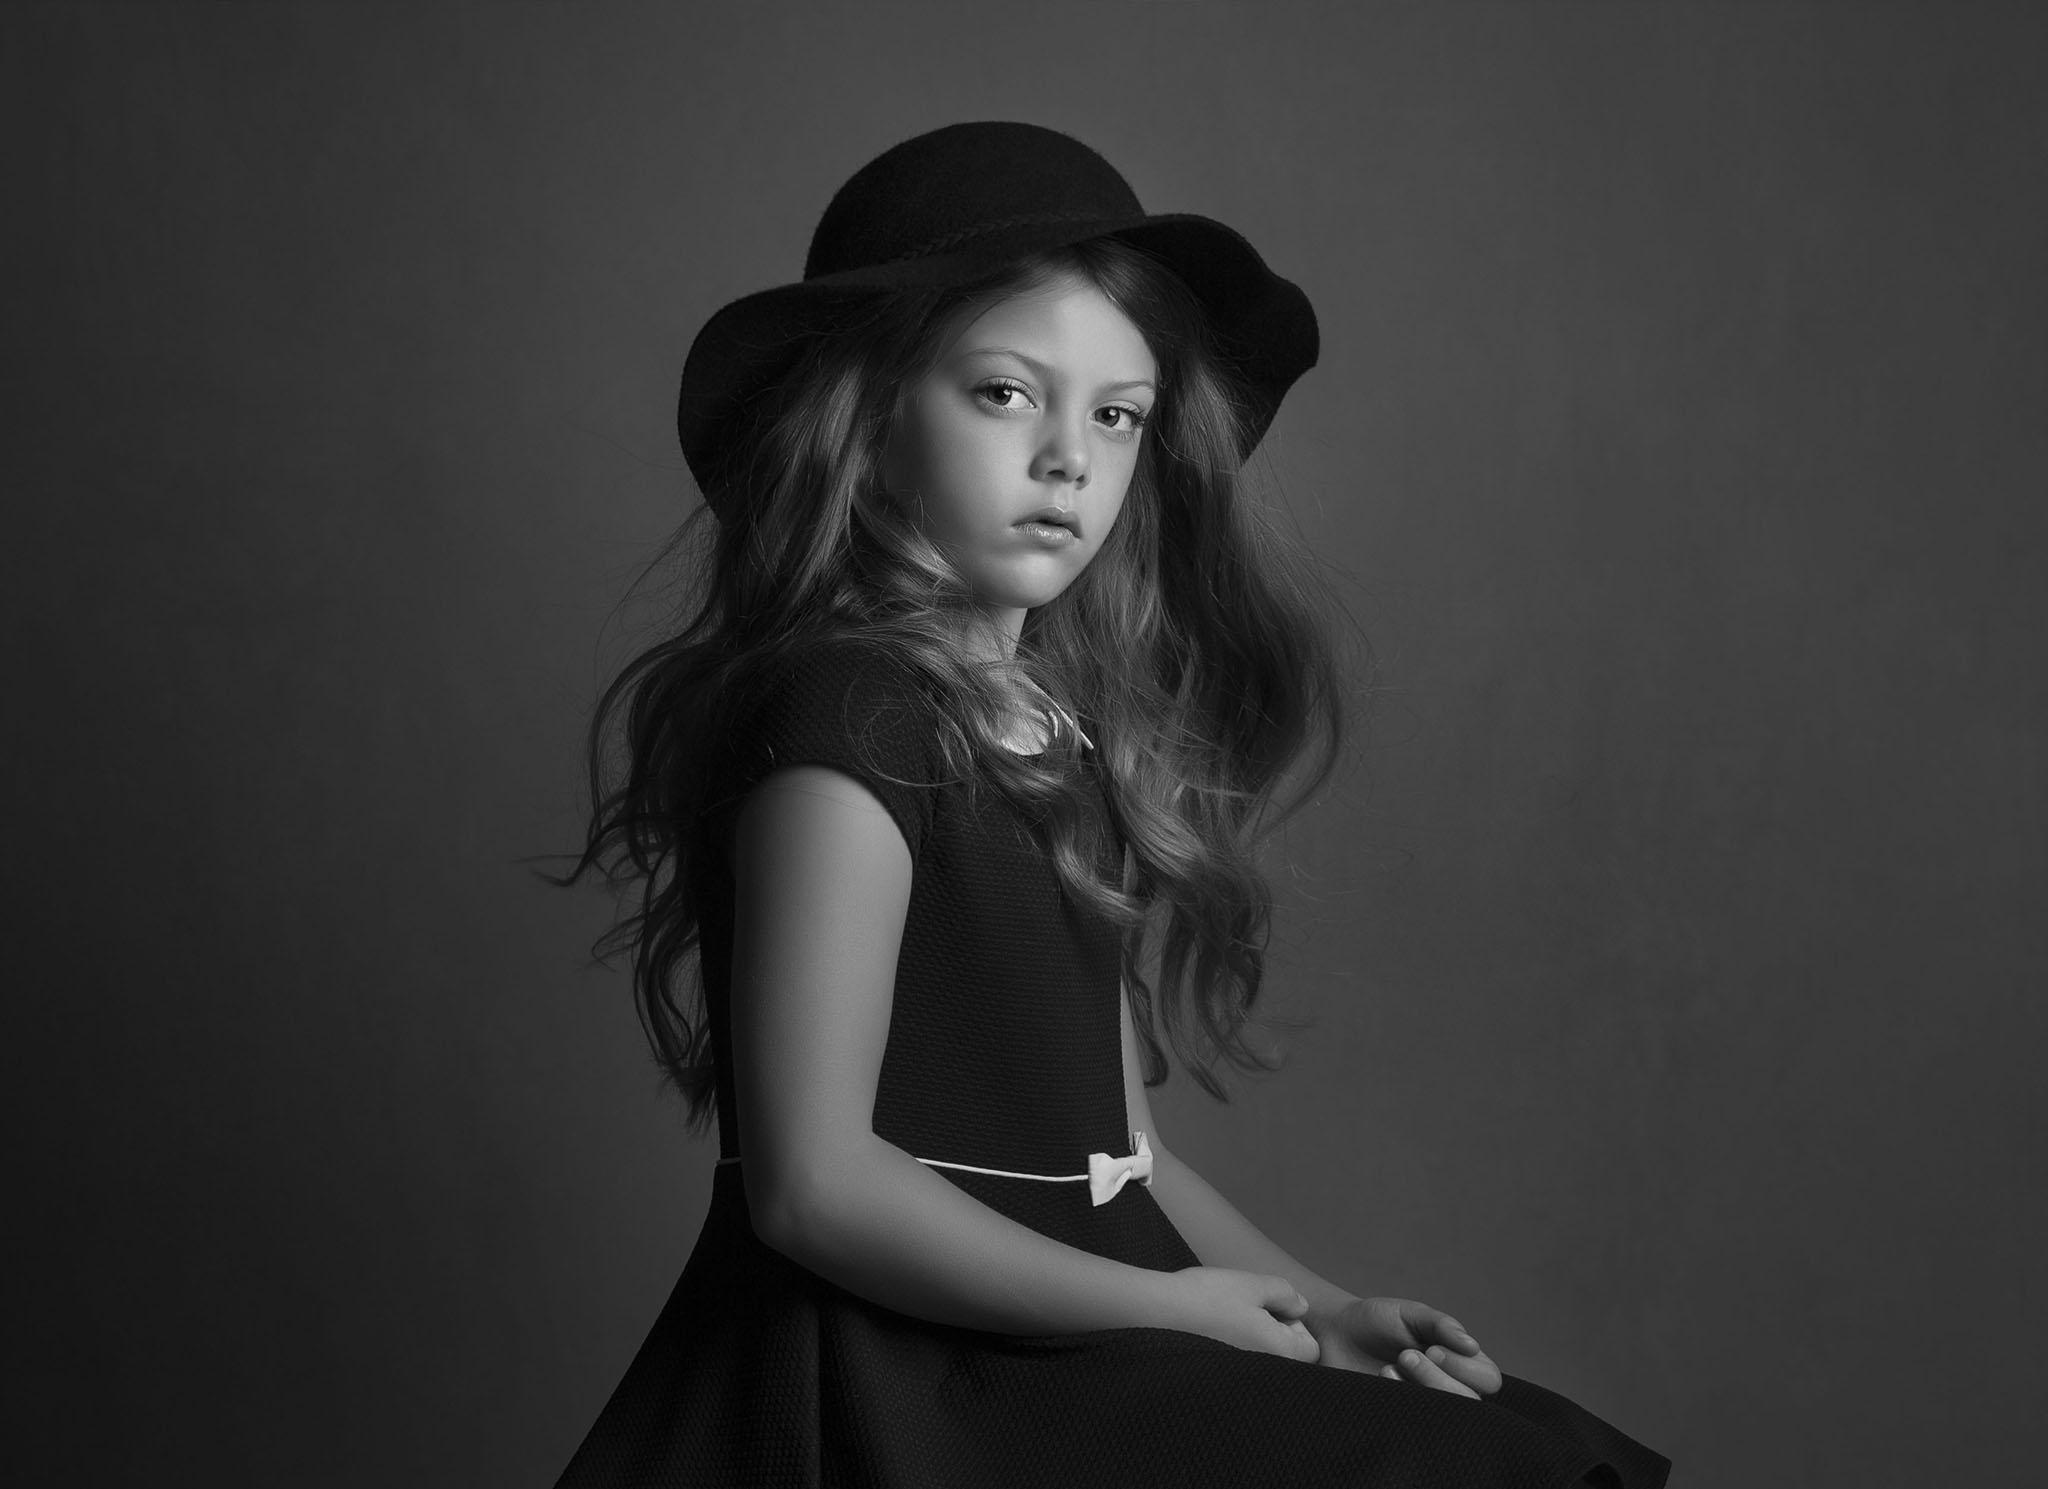 elizabethgphotography_kingslangley_hertfordshire_fineart_childrens_photography_34.jpg